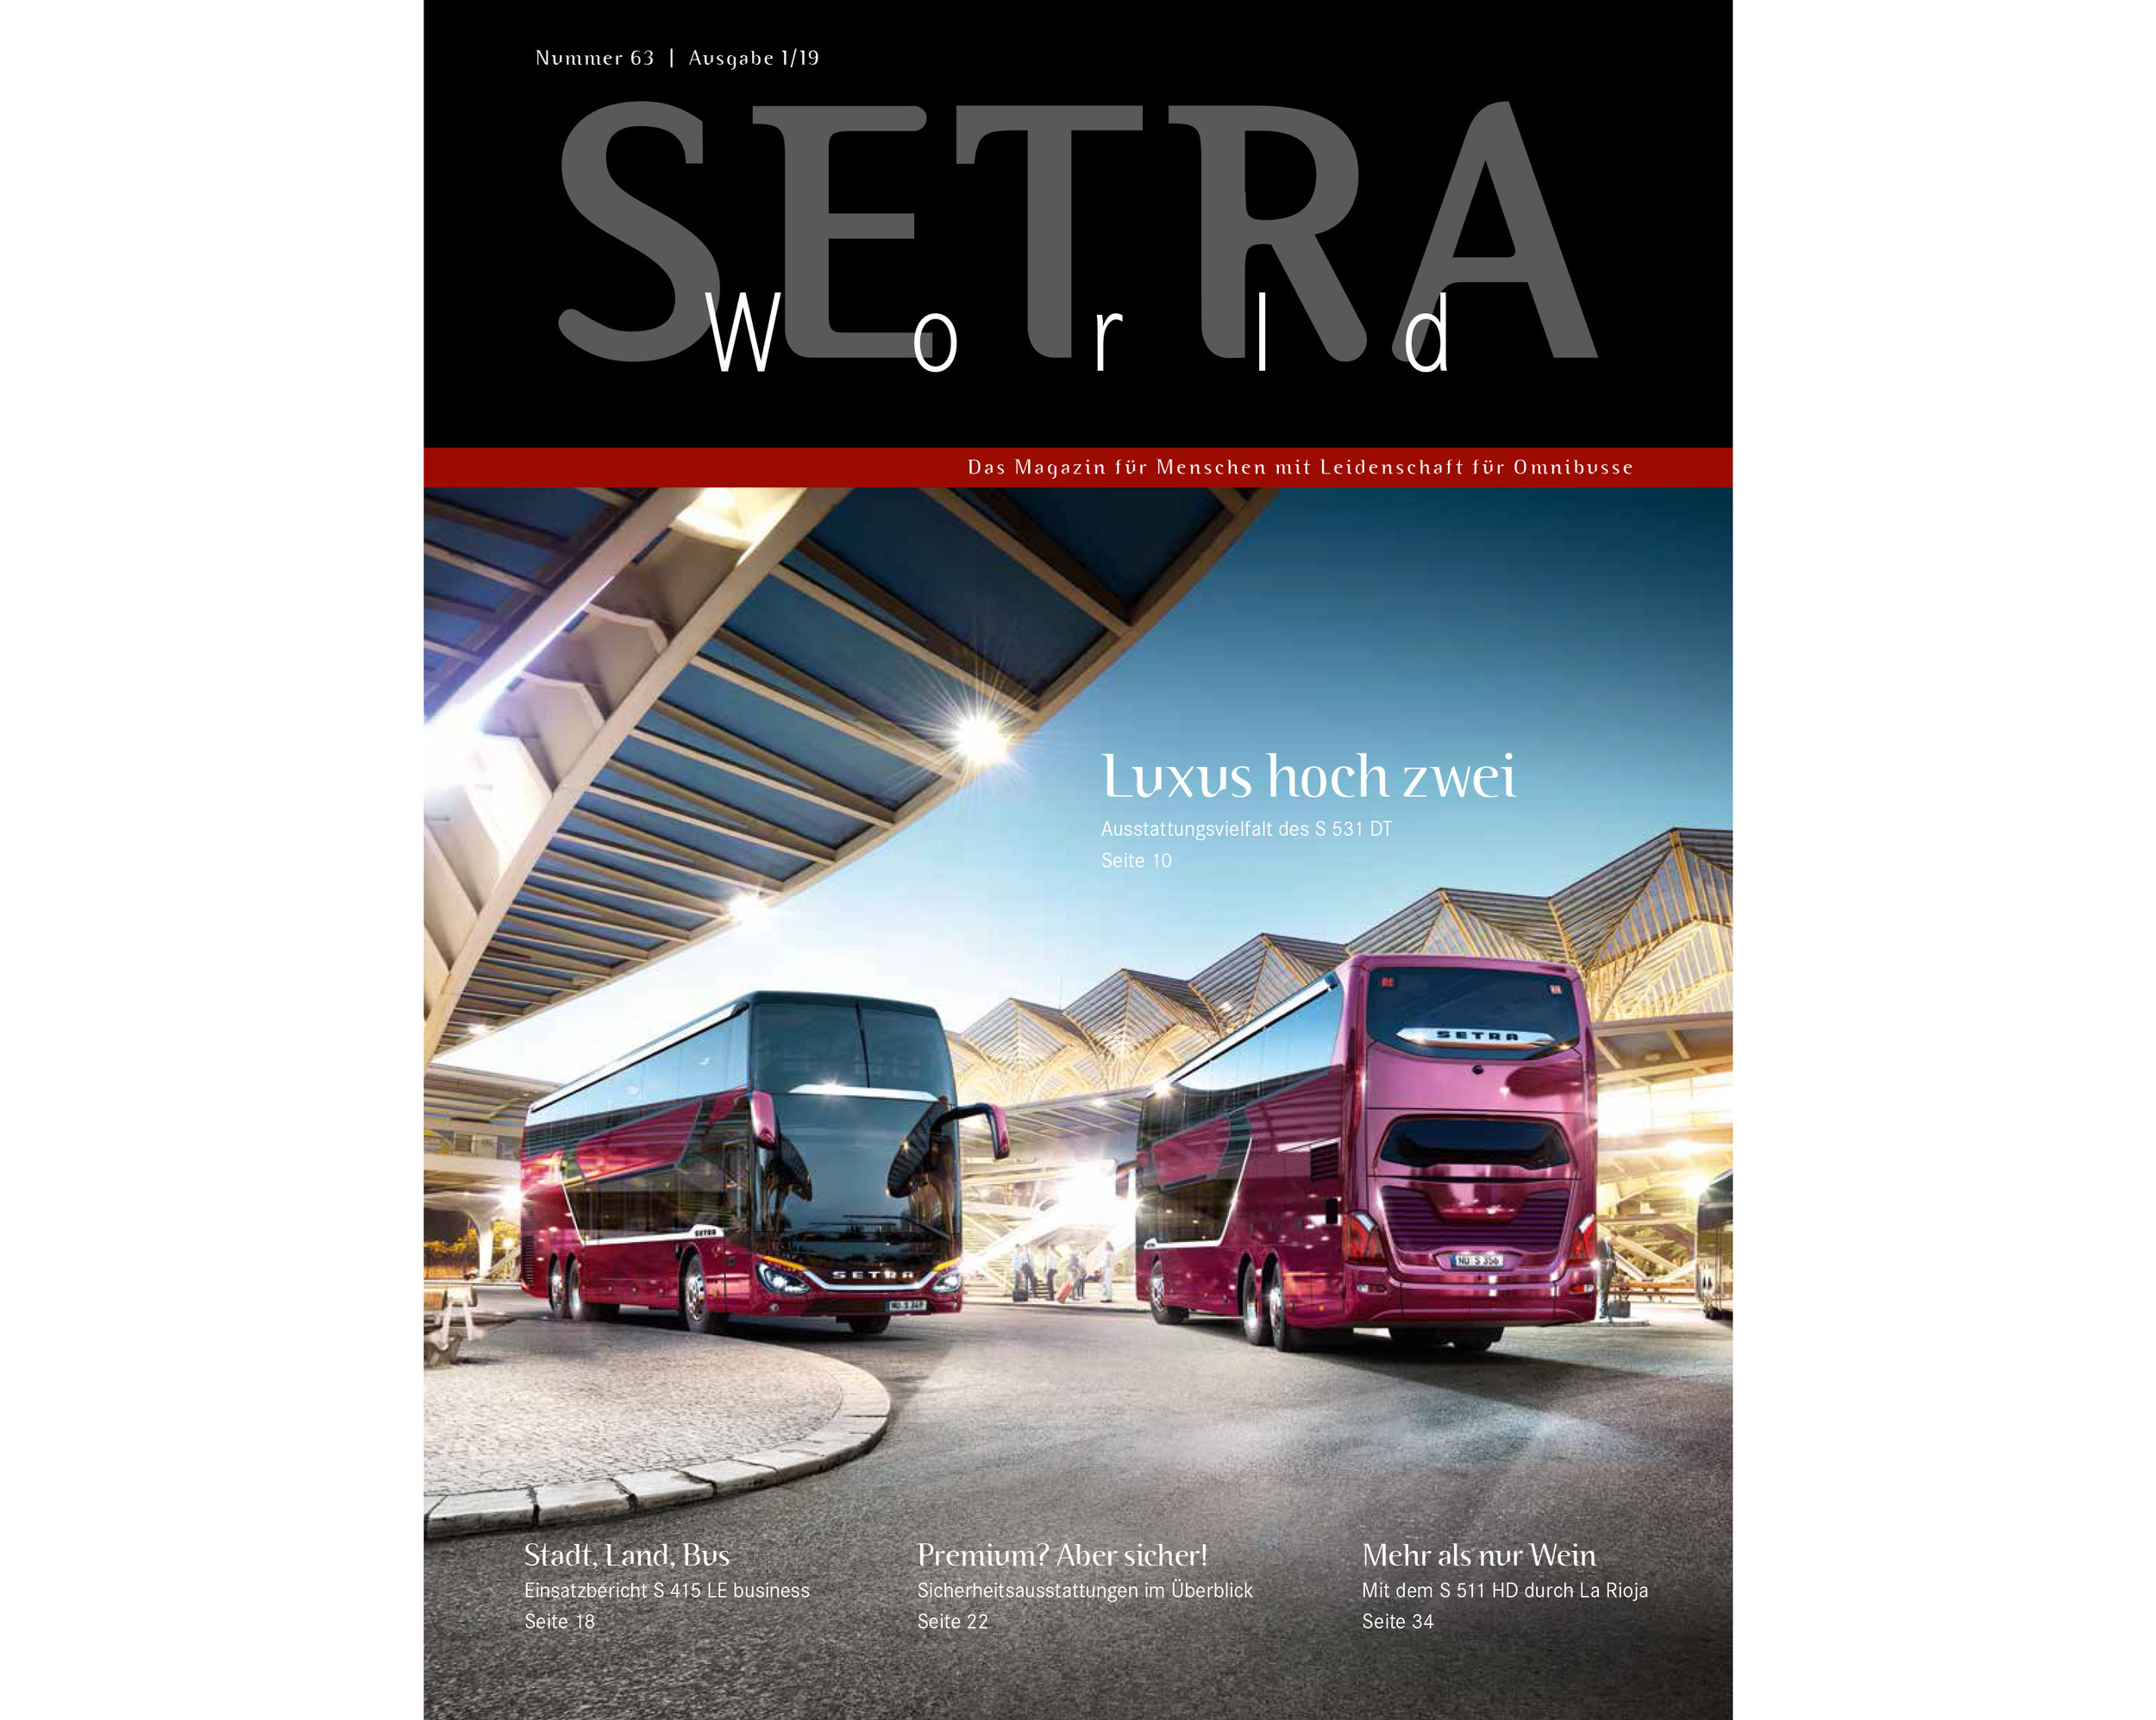 Setra_World_cover_12.jpg